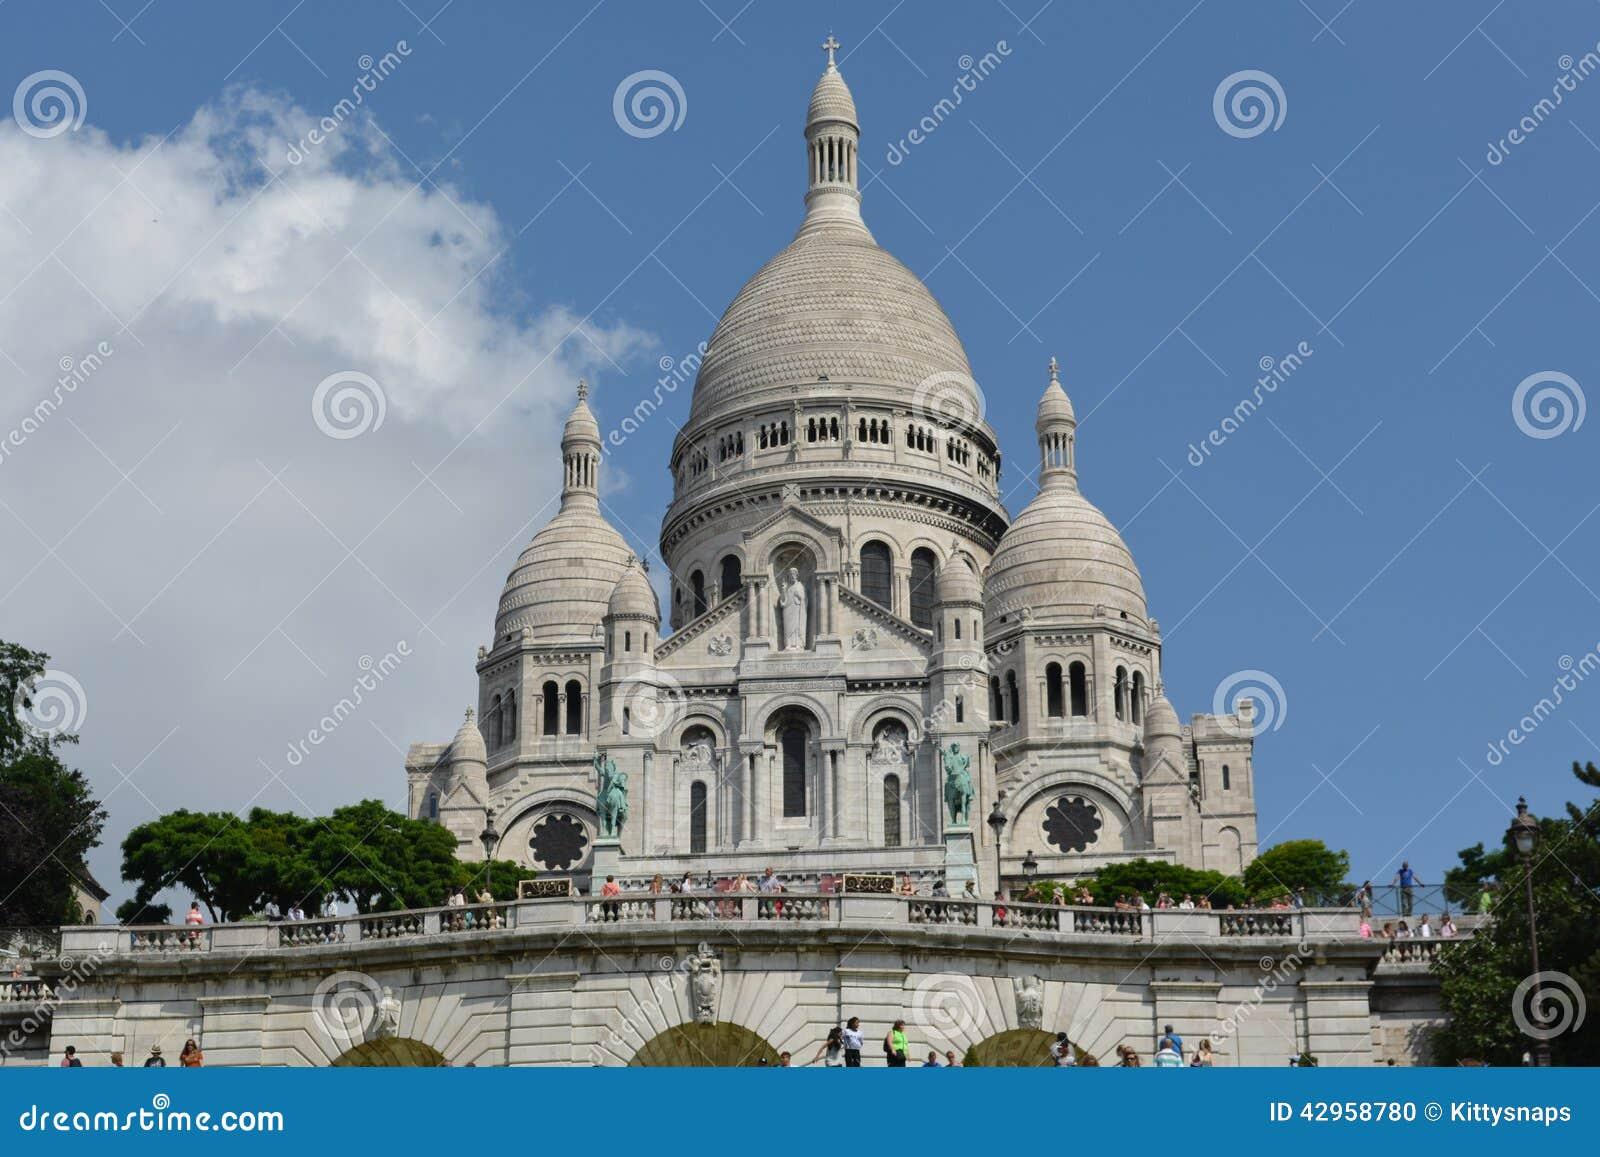 sacre coeur basilica paris france editorial image image of